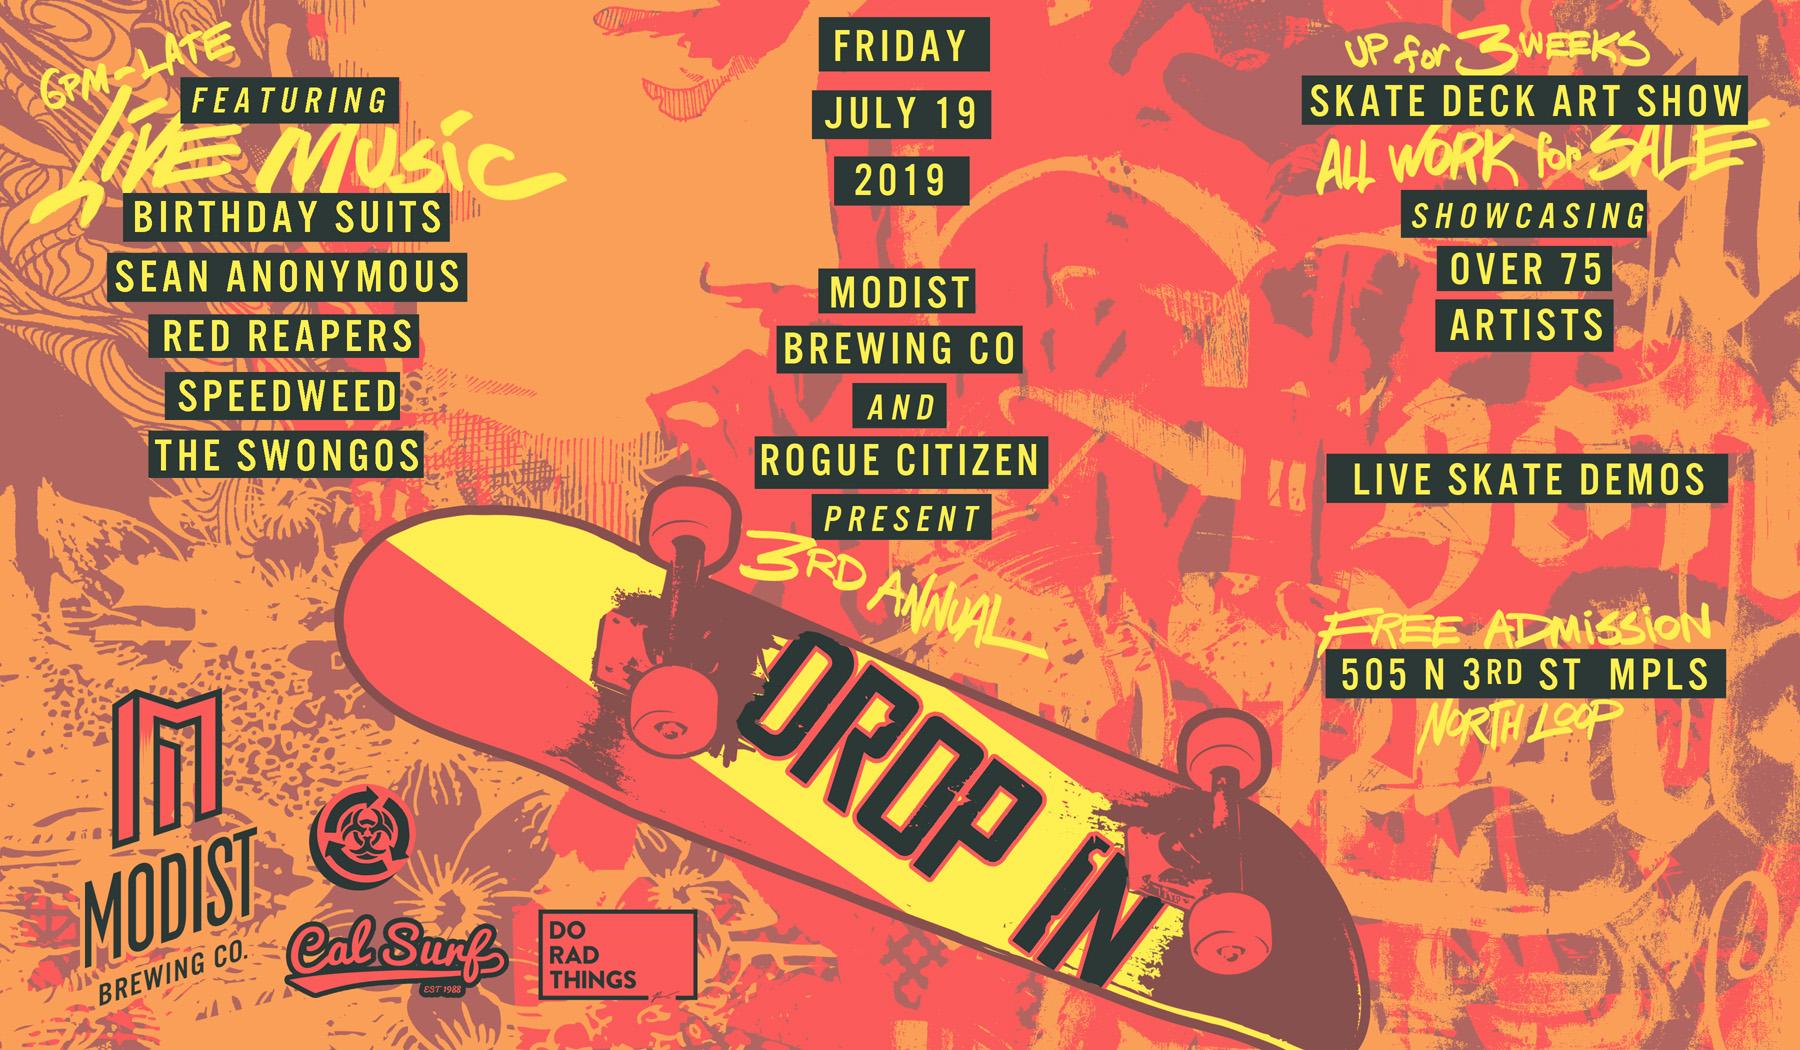 Drop In: Skateboarding, Art, & Live Music - Modist Brewing Co